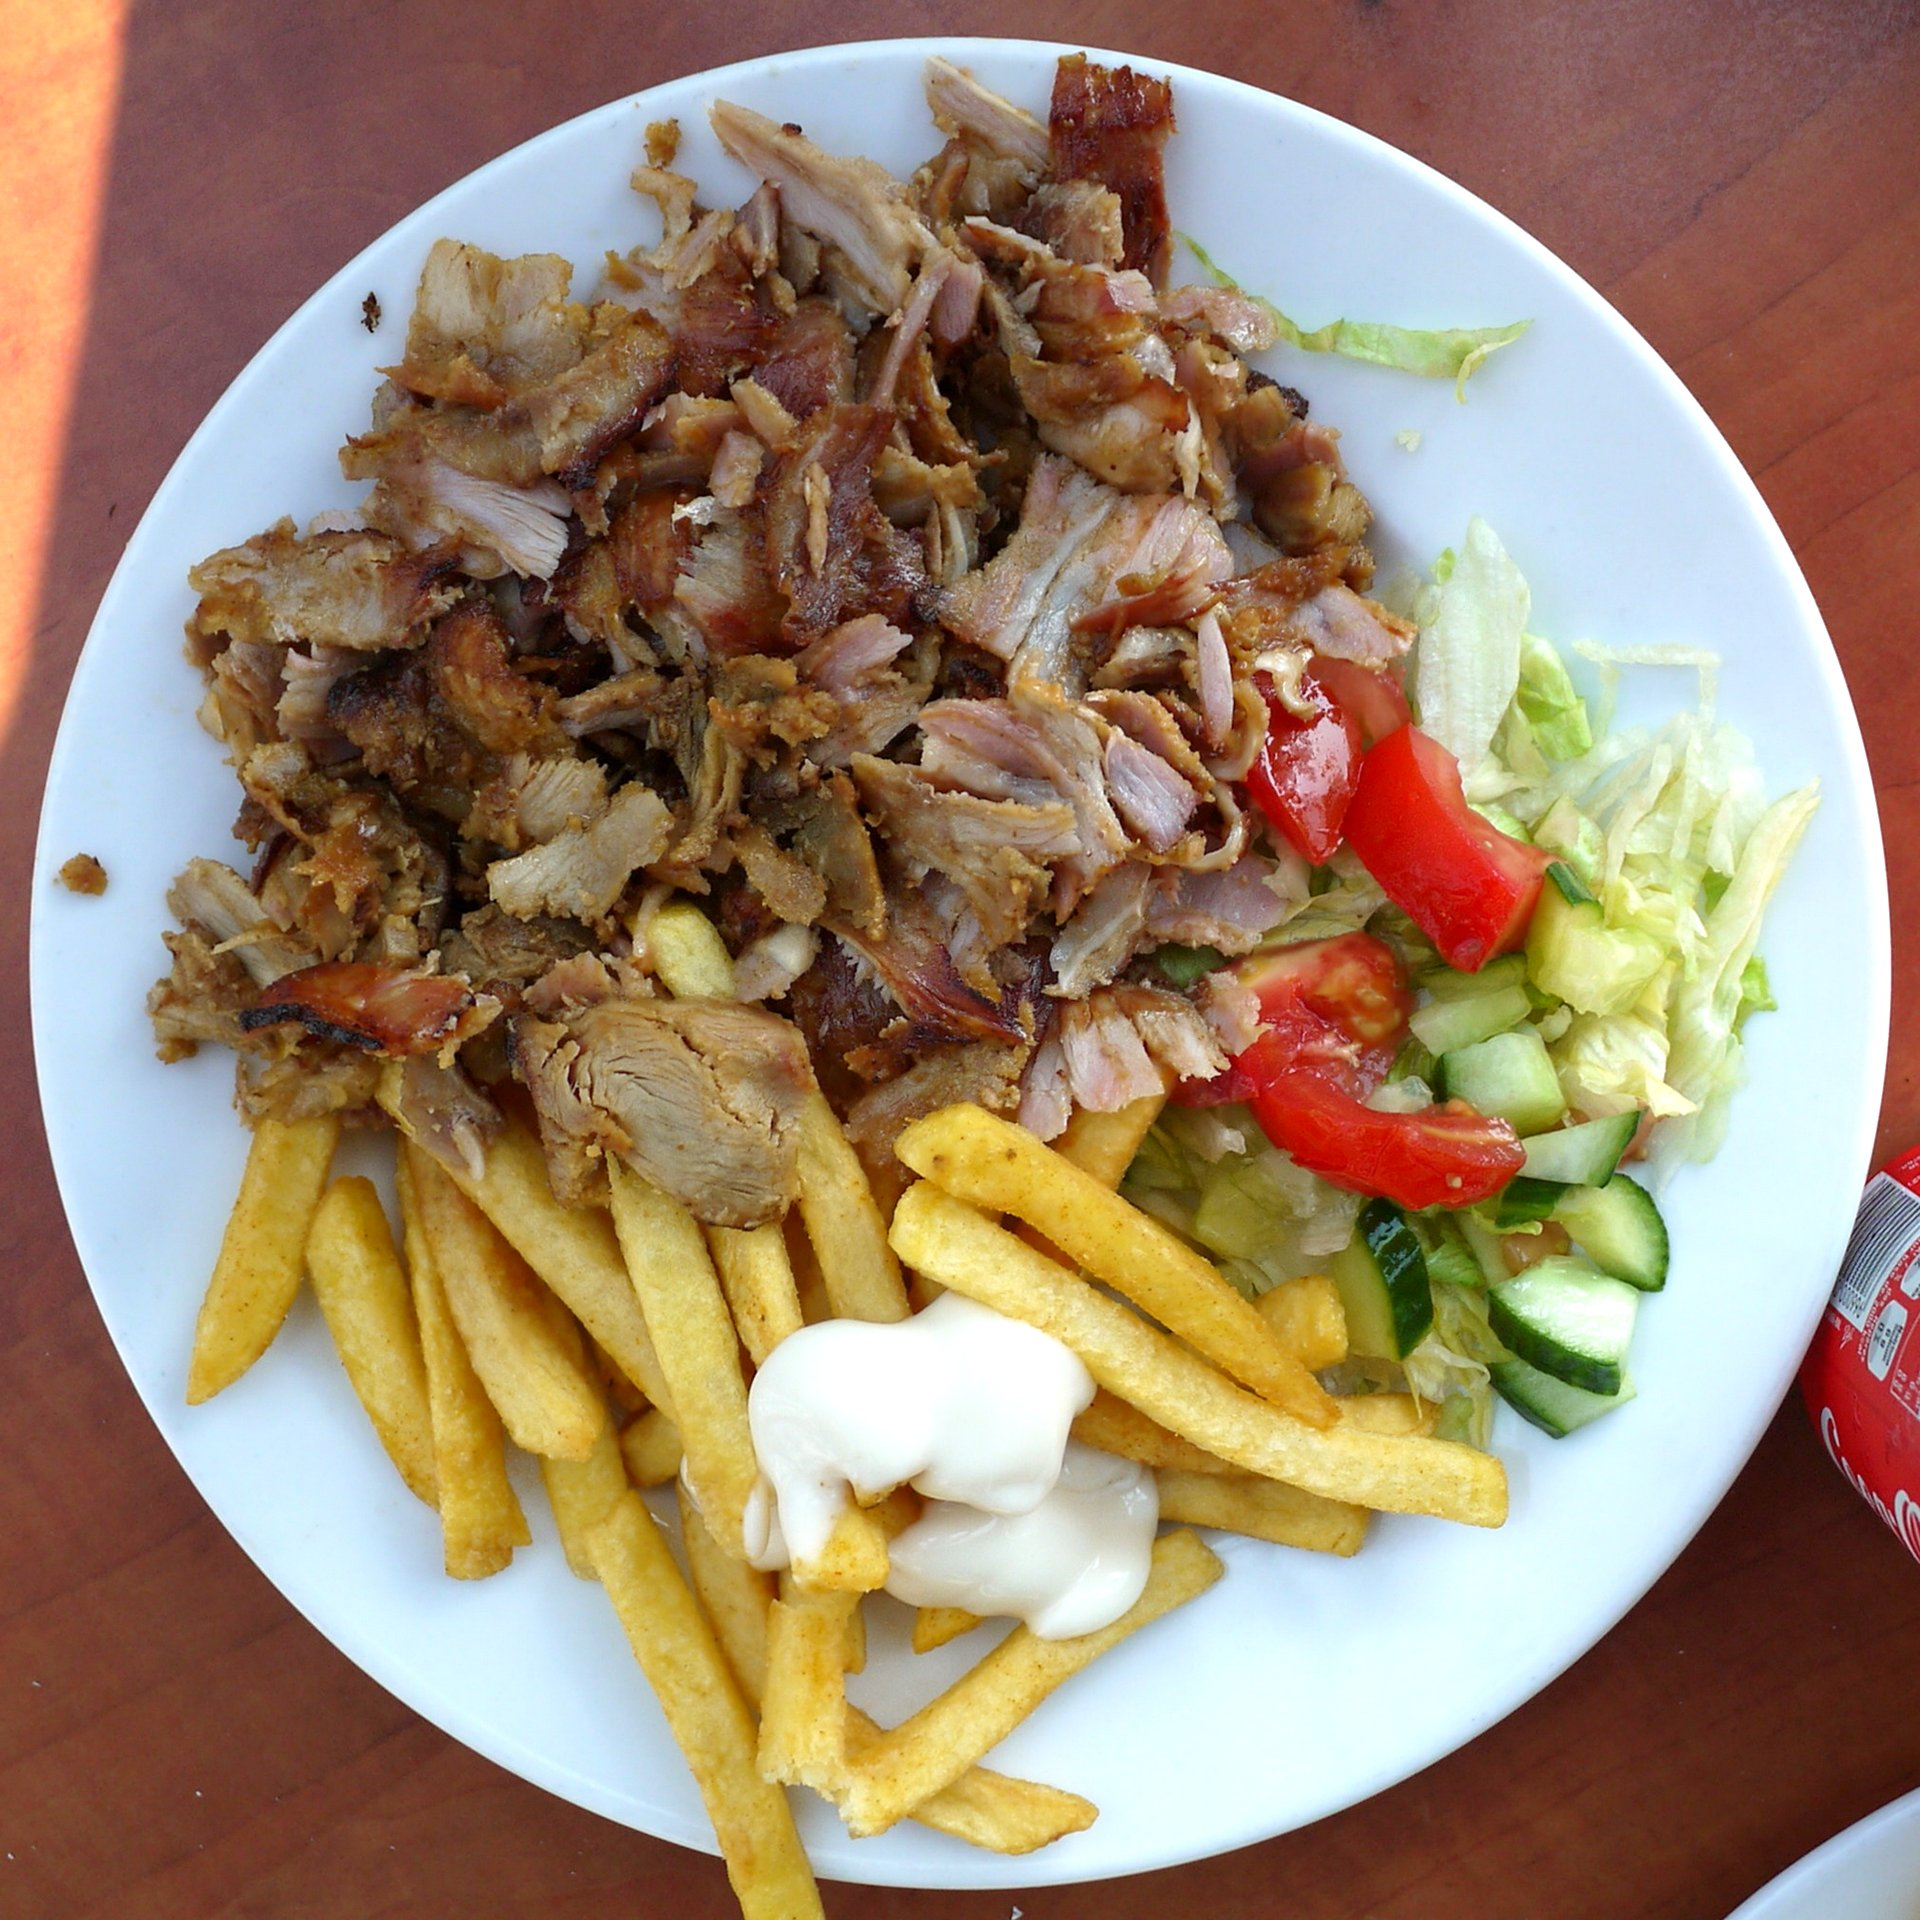 © Takeaway/ Middle Eastern Cuisine/Wiki Commons